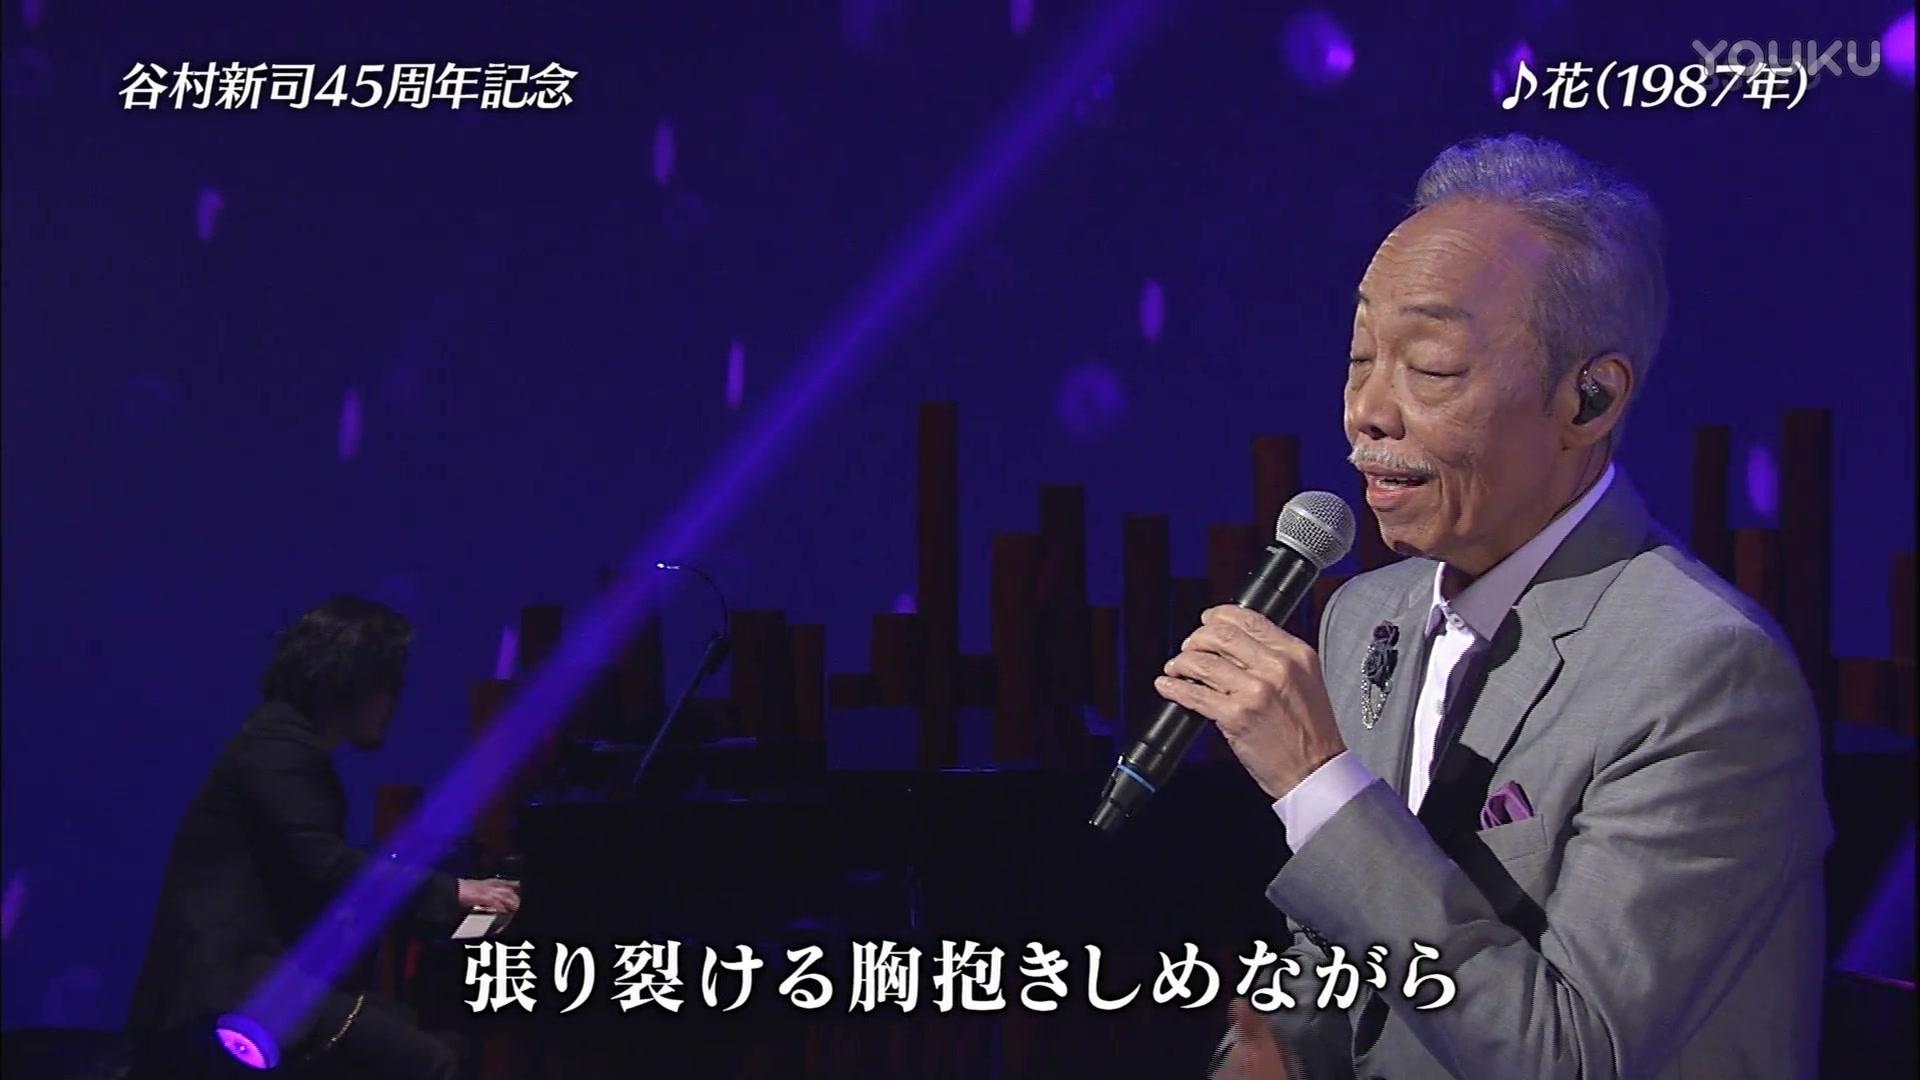 优酷网_花 谷村新司 2017 上海演唱会 1080p_哔哩哔哩 (゜-゜)つロ 干杯~-bilibili